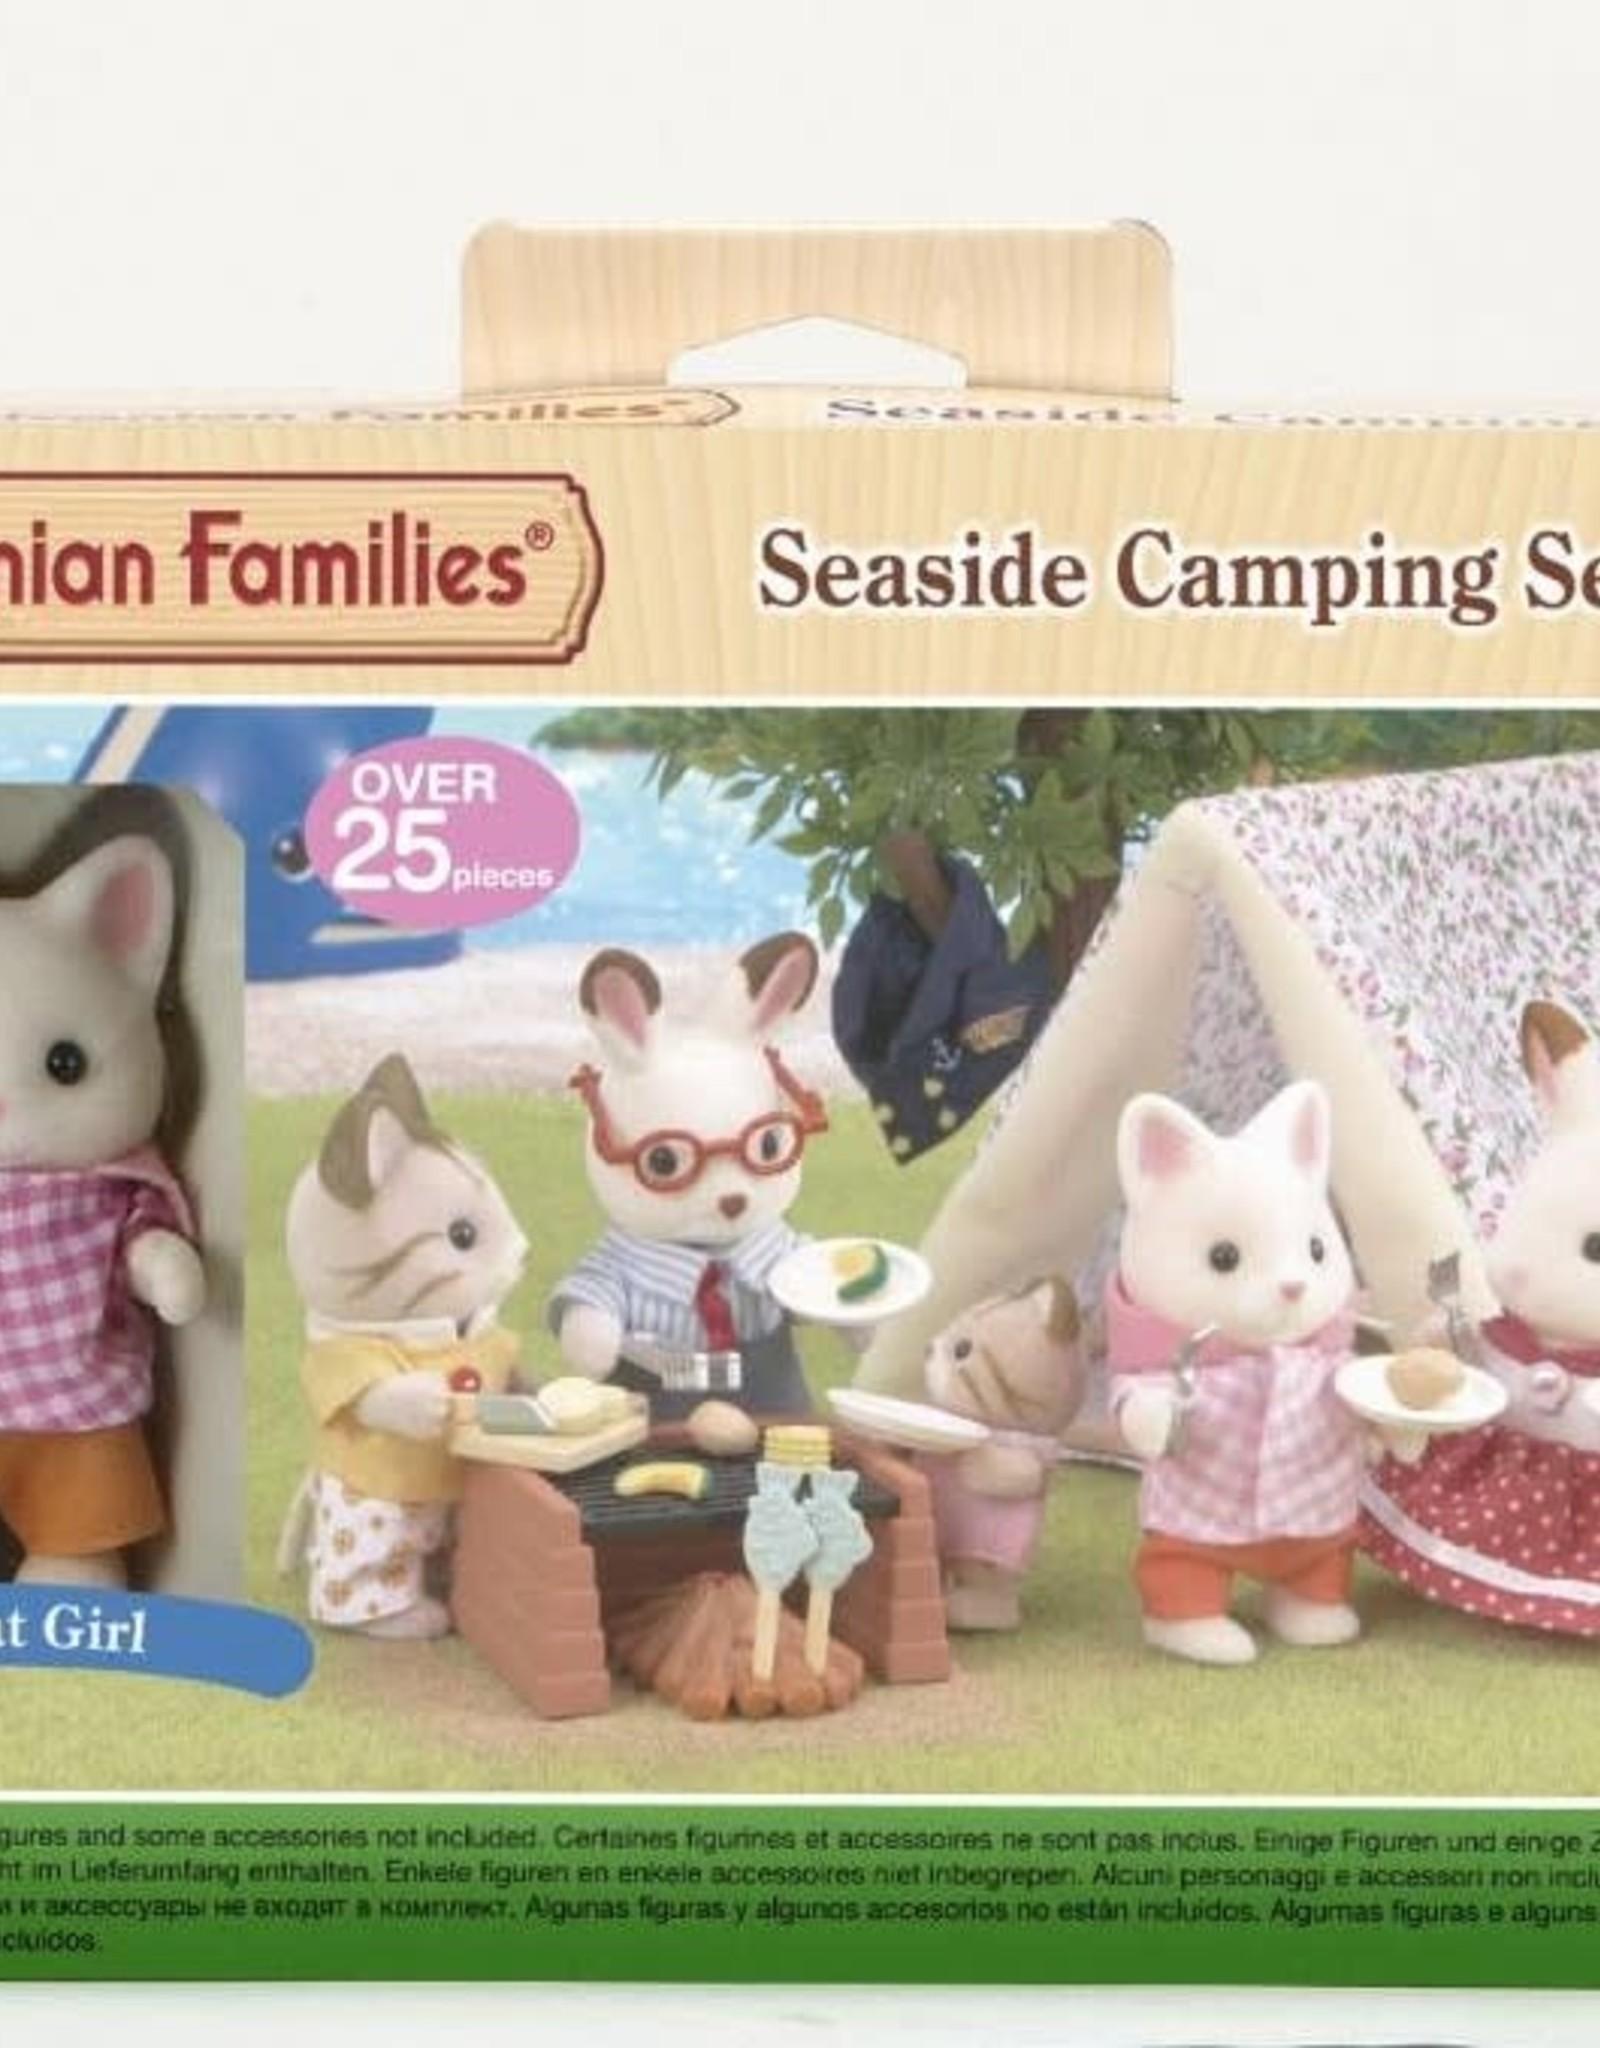 Sylvanian Families Seaside Camping set